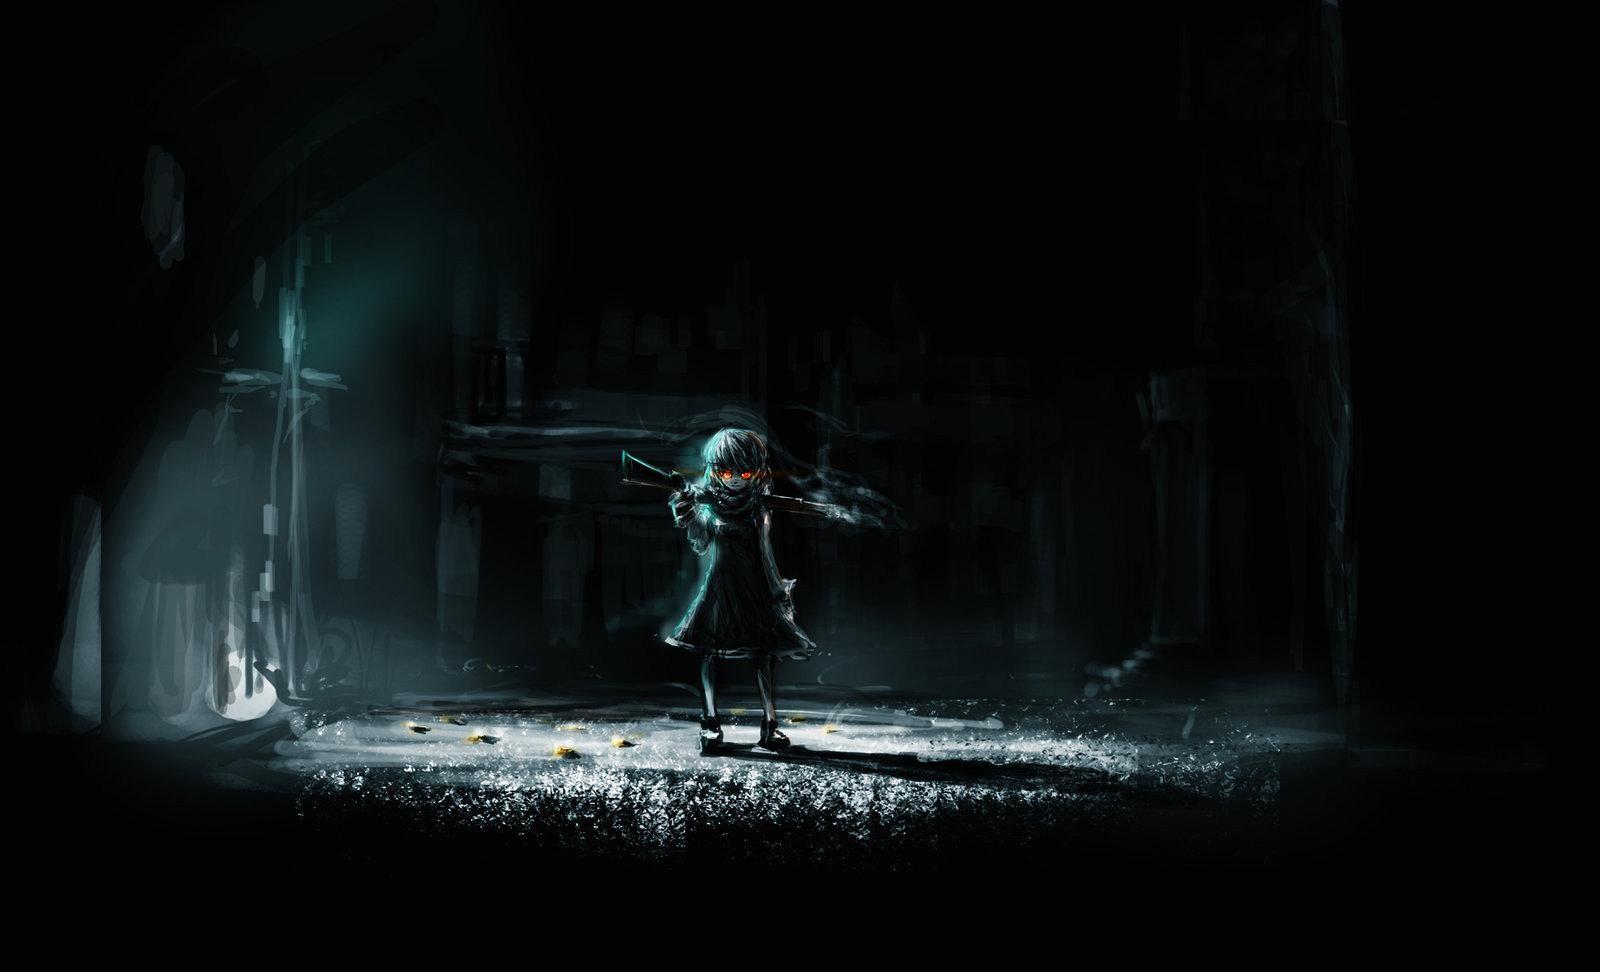 Wallpaper dark night anime girls artwork midnight light stage darkness screenshot - Midnight wallpaper hd ...